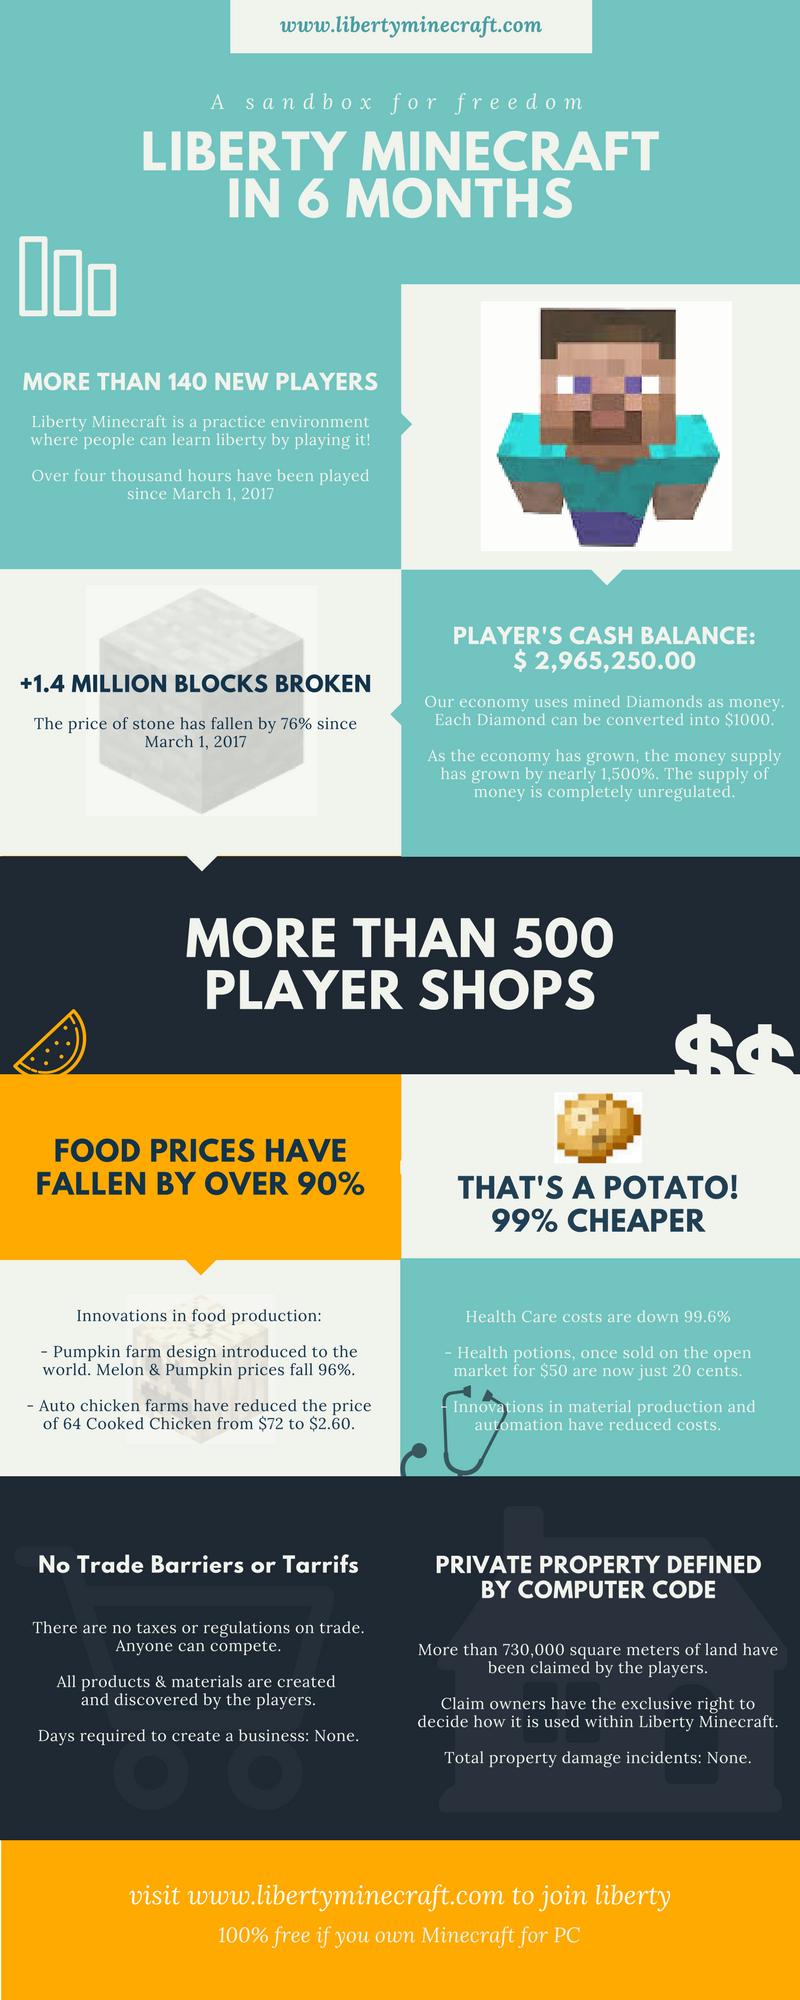 Liberty Minecraft Infographic